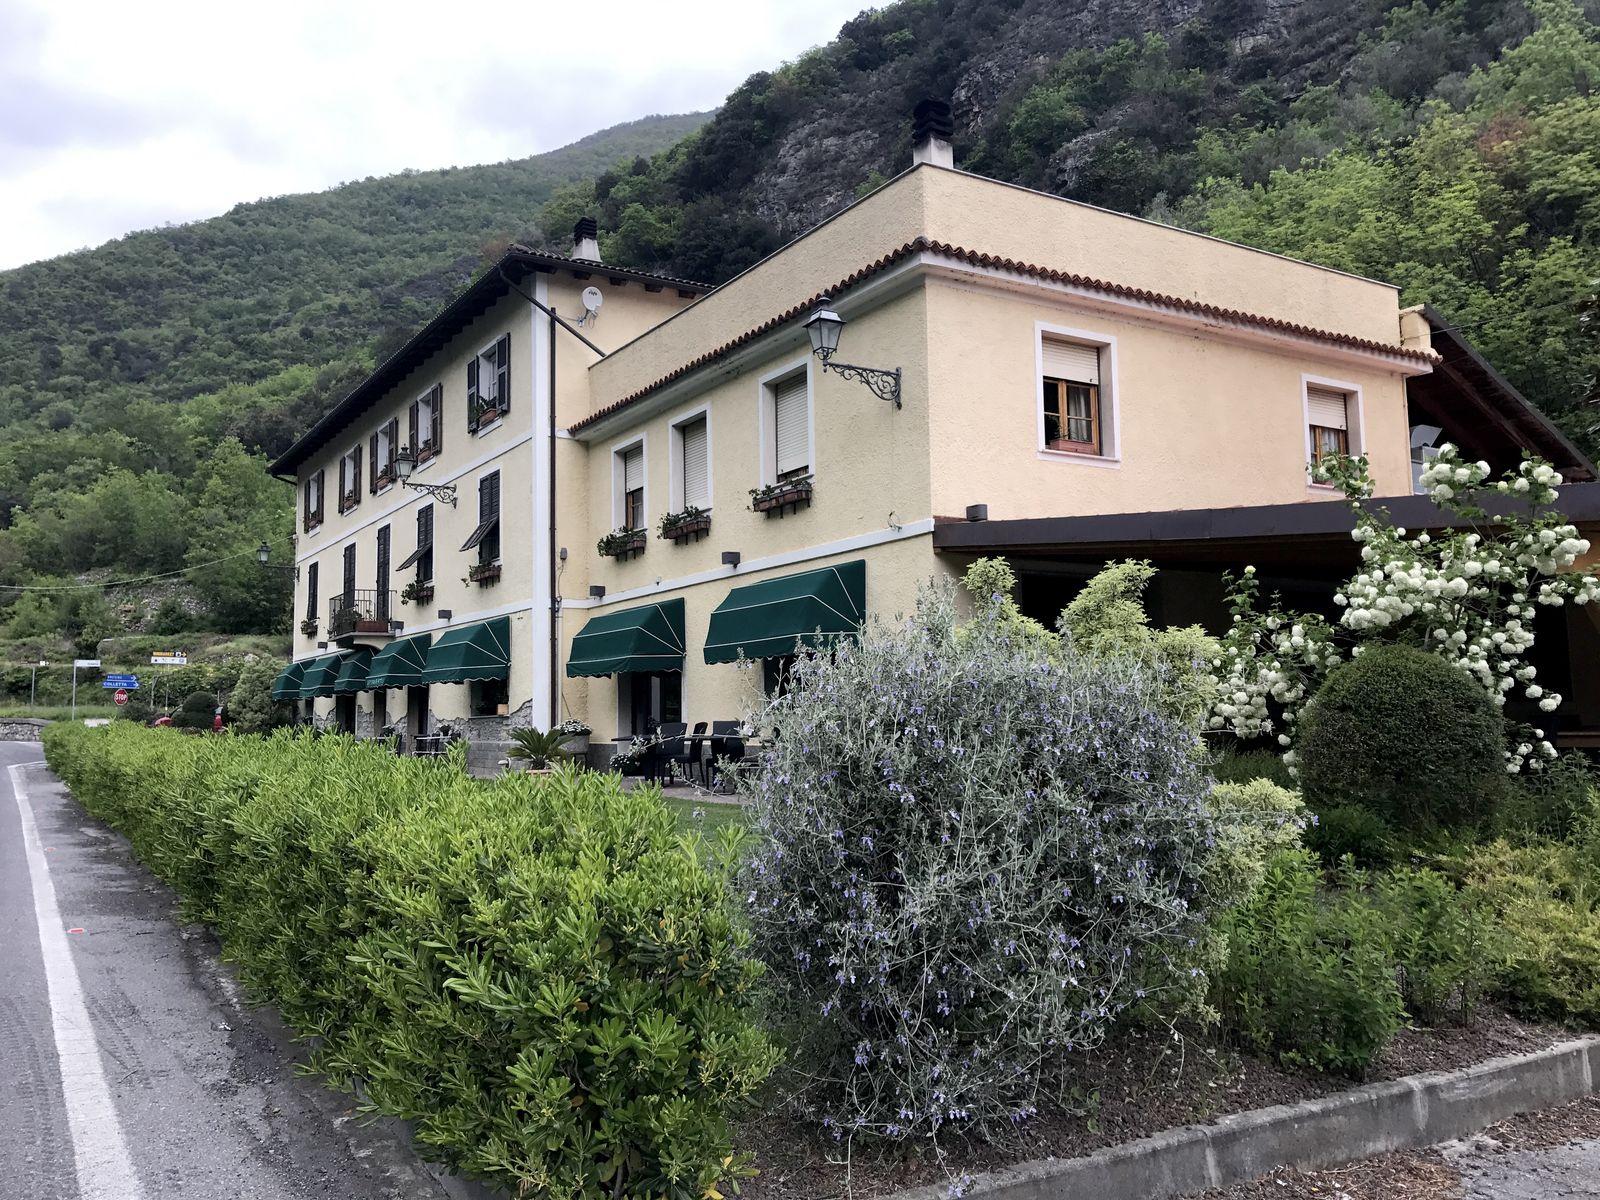 Ristorate Scola a Castelbianco